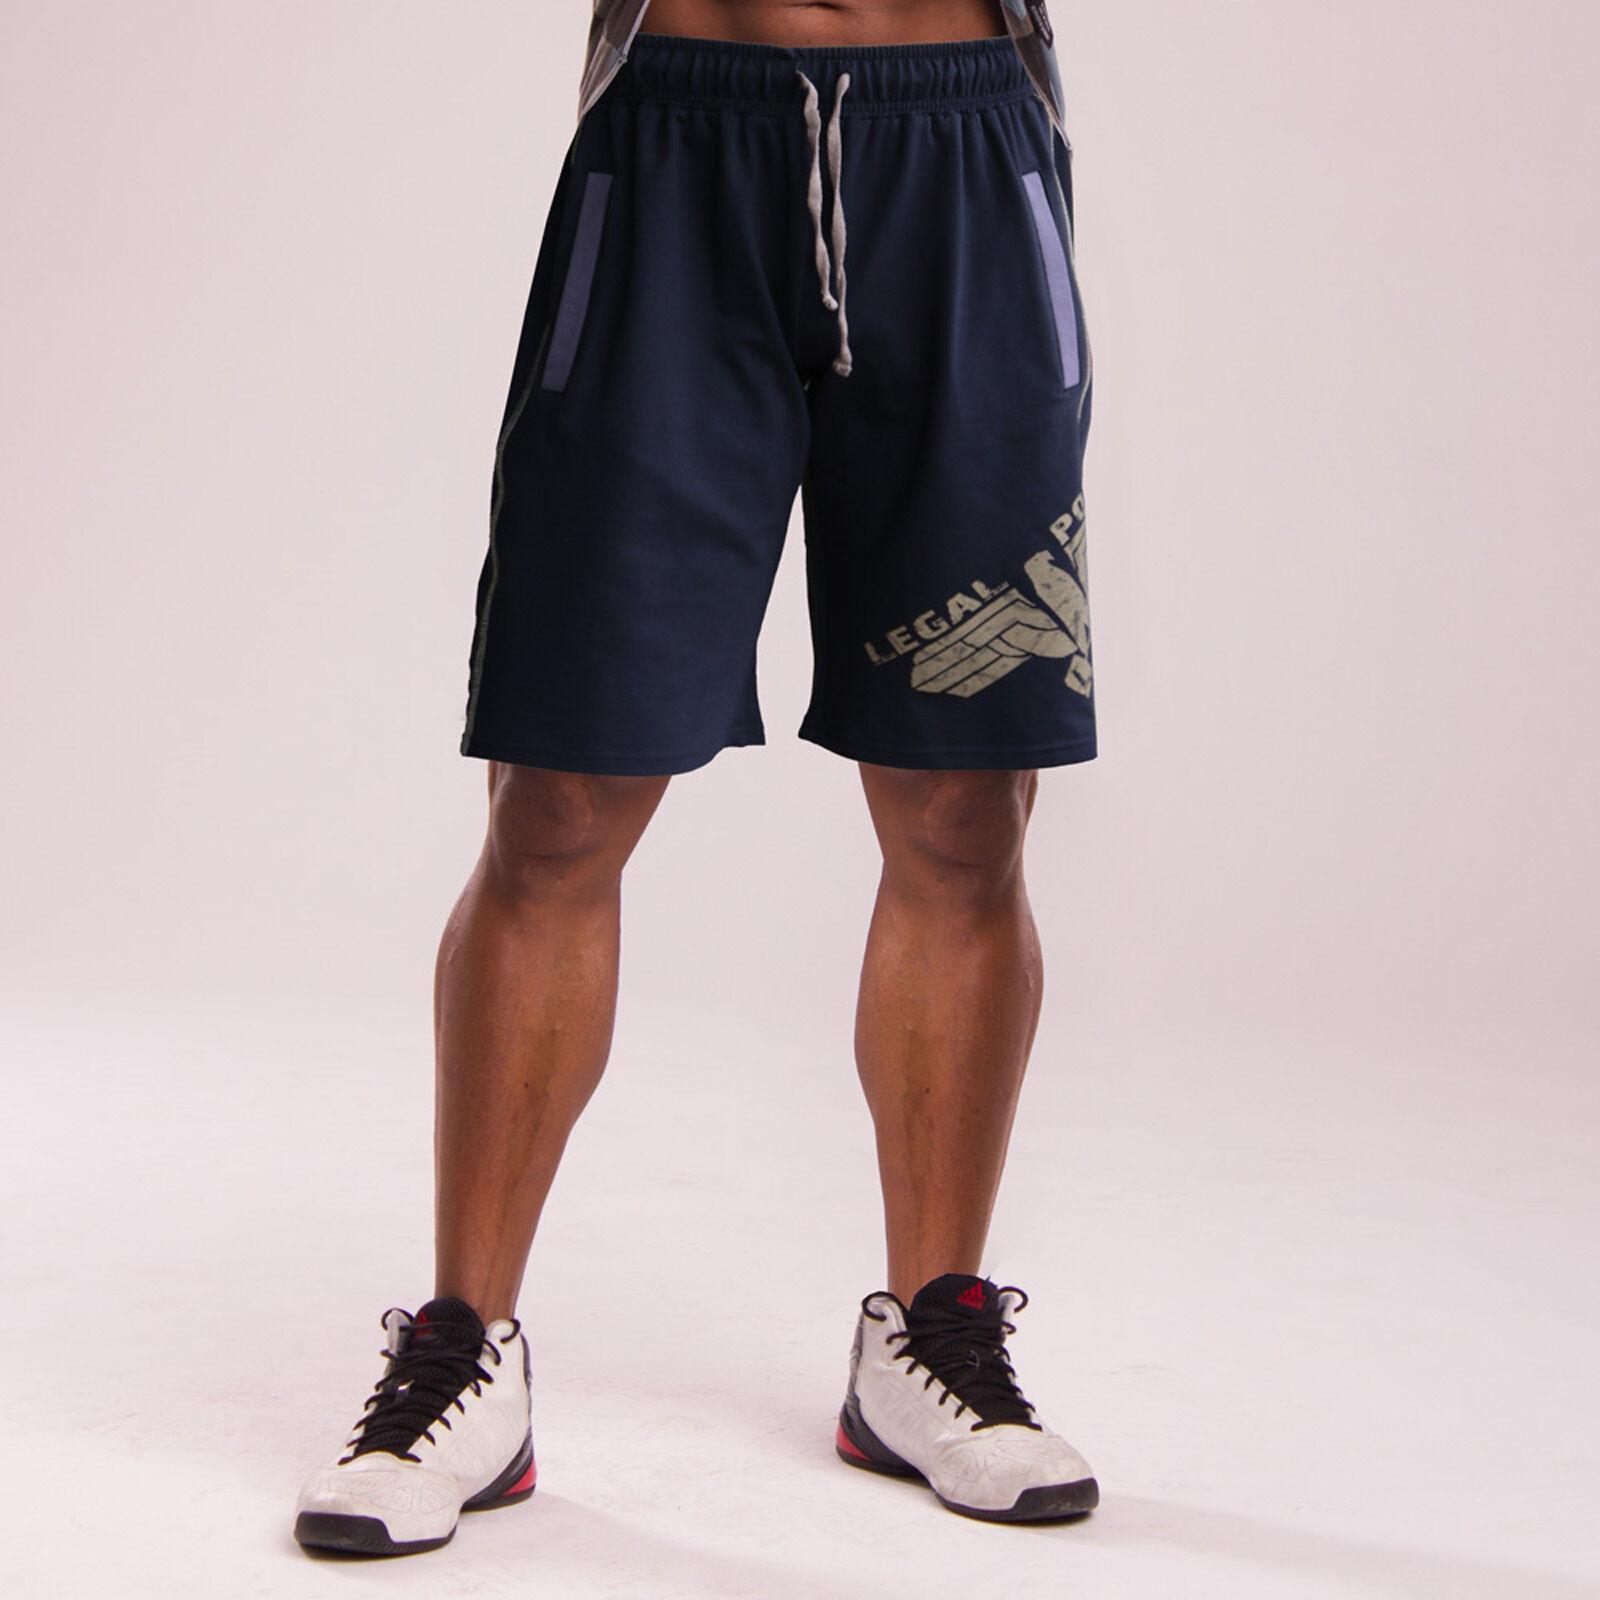 LP Limits   Legal Power Shorts Eagle - Classic - Cotton Polyester Spandex